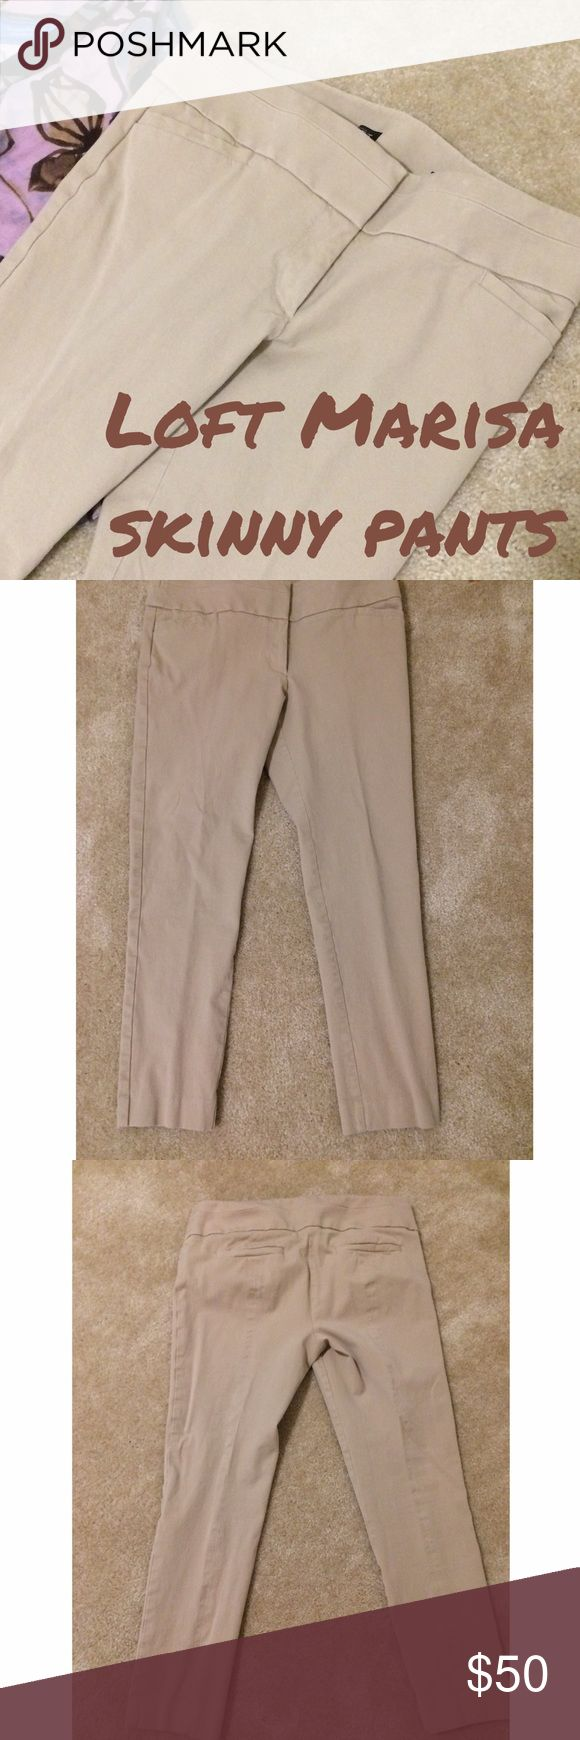 🌼Loft Marisa skinny khaki pants 🌟SALE Buy $50 or more of items marked 🌼, get a $15 item for free🌟 Loft Marisa skinny pants in khaki...EUC..about 15.5 in flat at waist..about 9 in rise.about 24 in inseam LOFT Pants Skinny